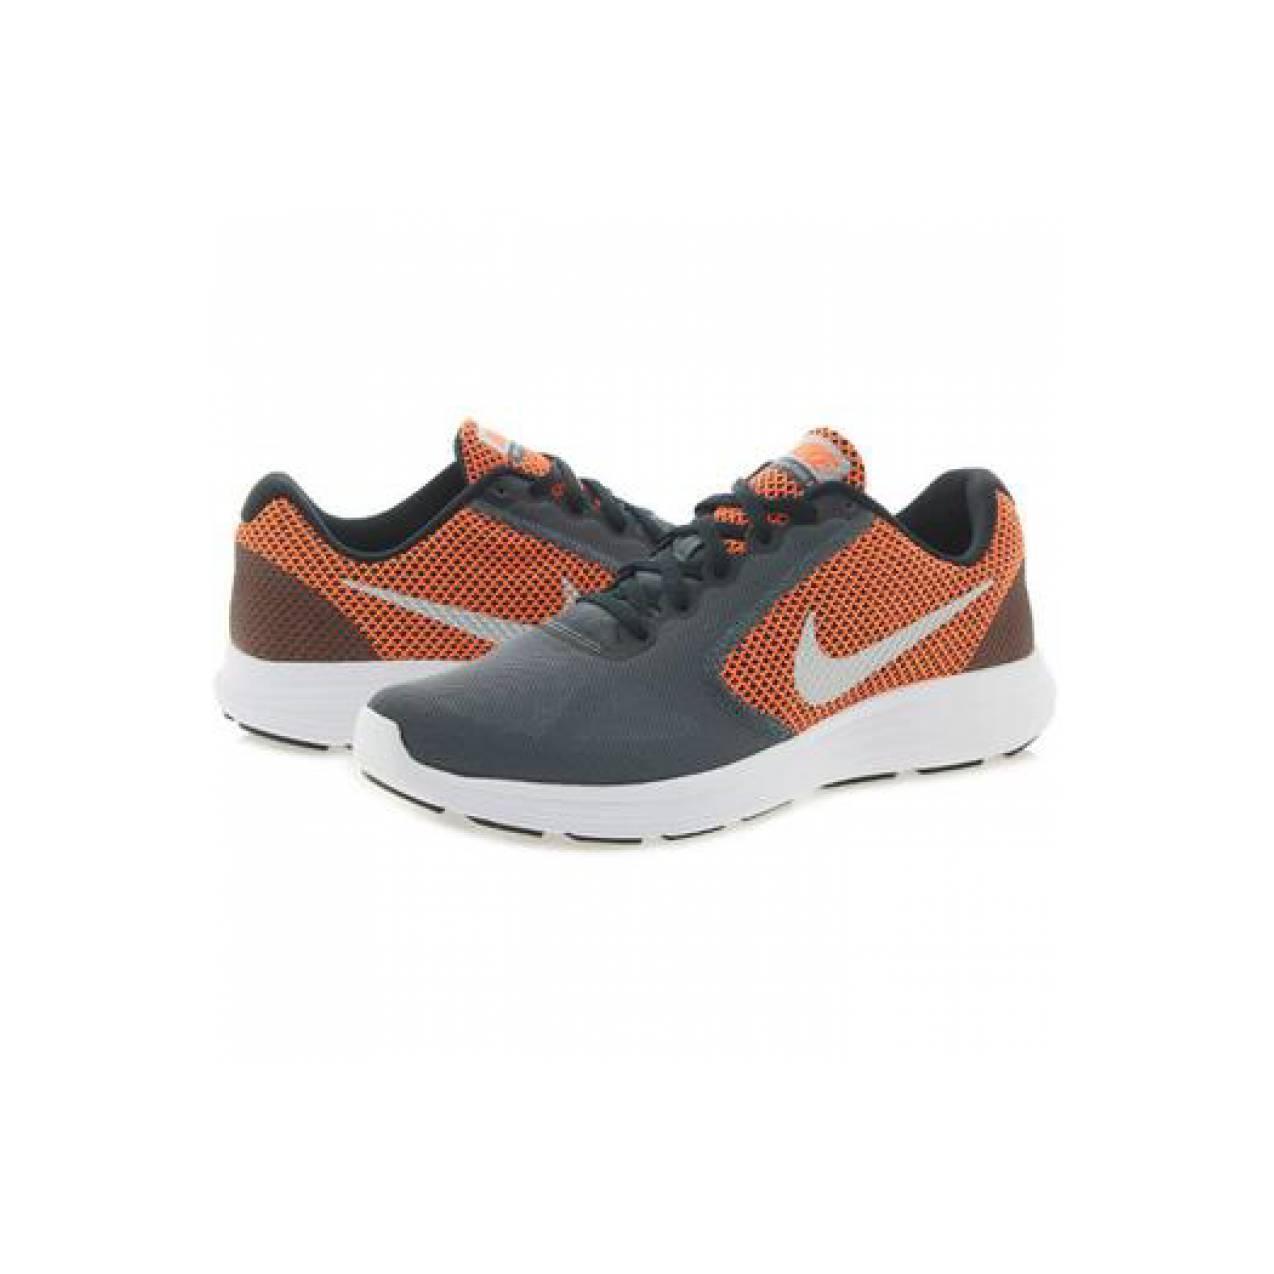 Sepatu running nike original Revolution 3 abu abu-orange jogging